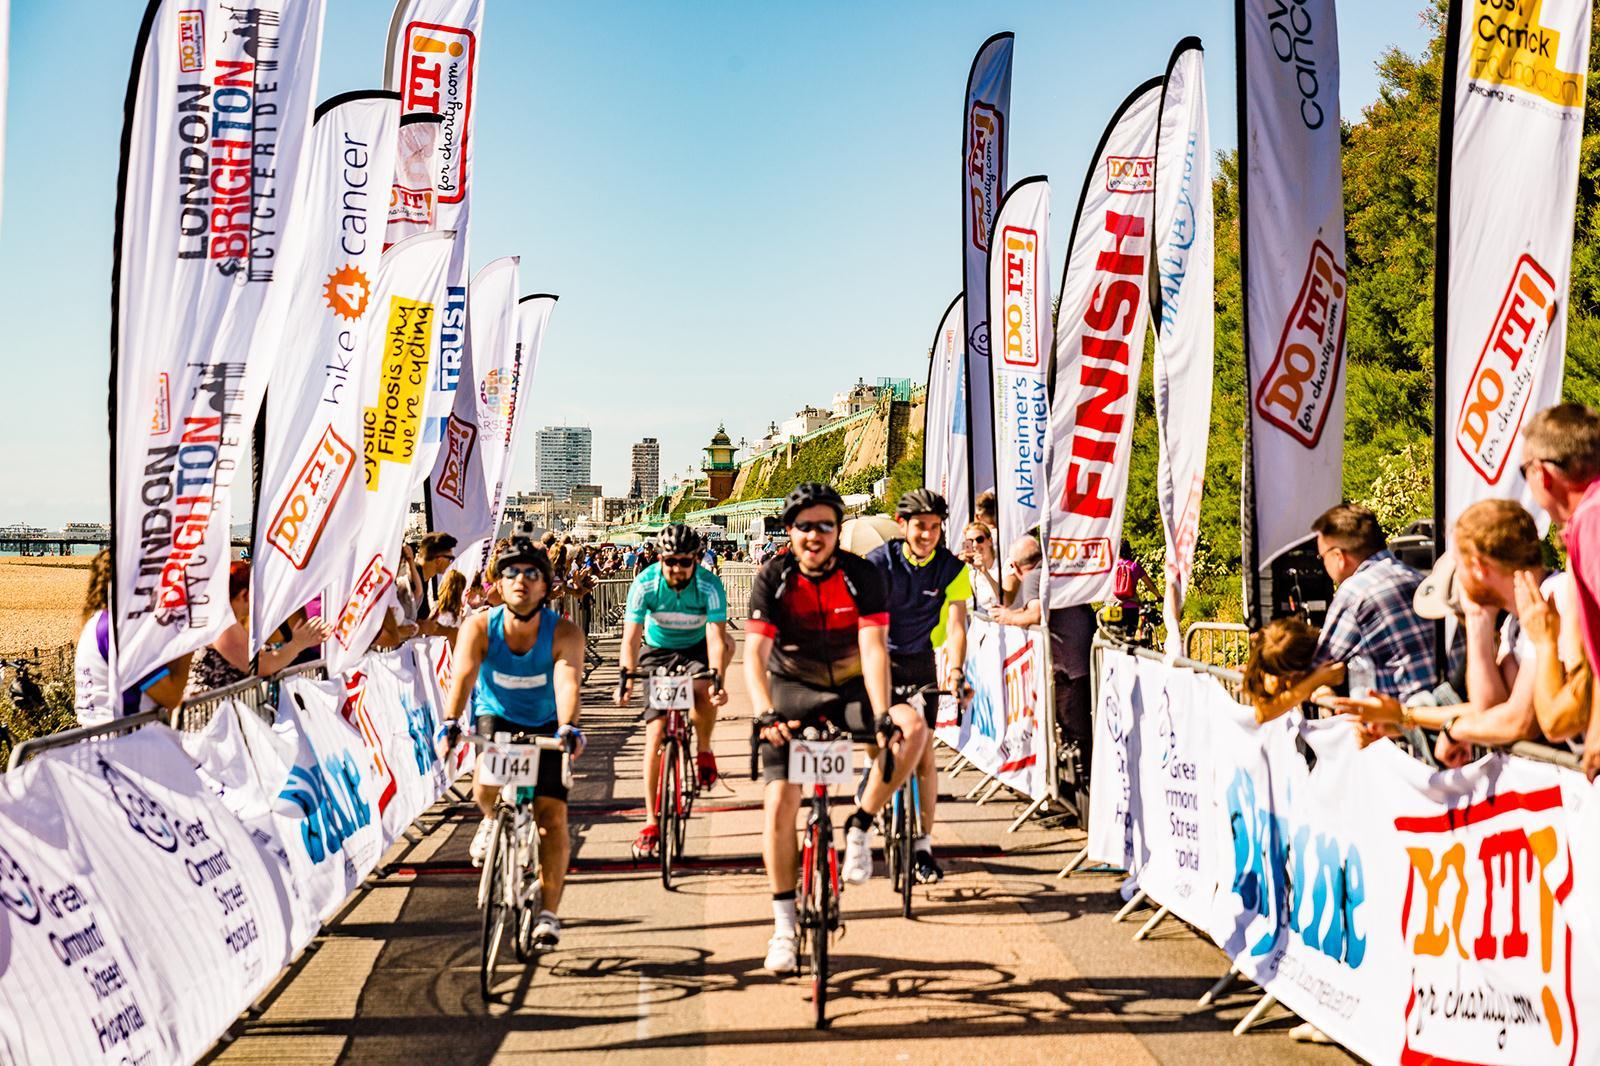 London to Brighton Bike Ride Finish Line